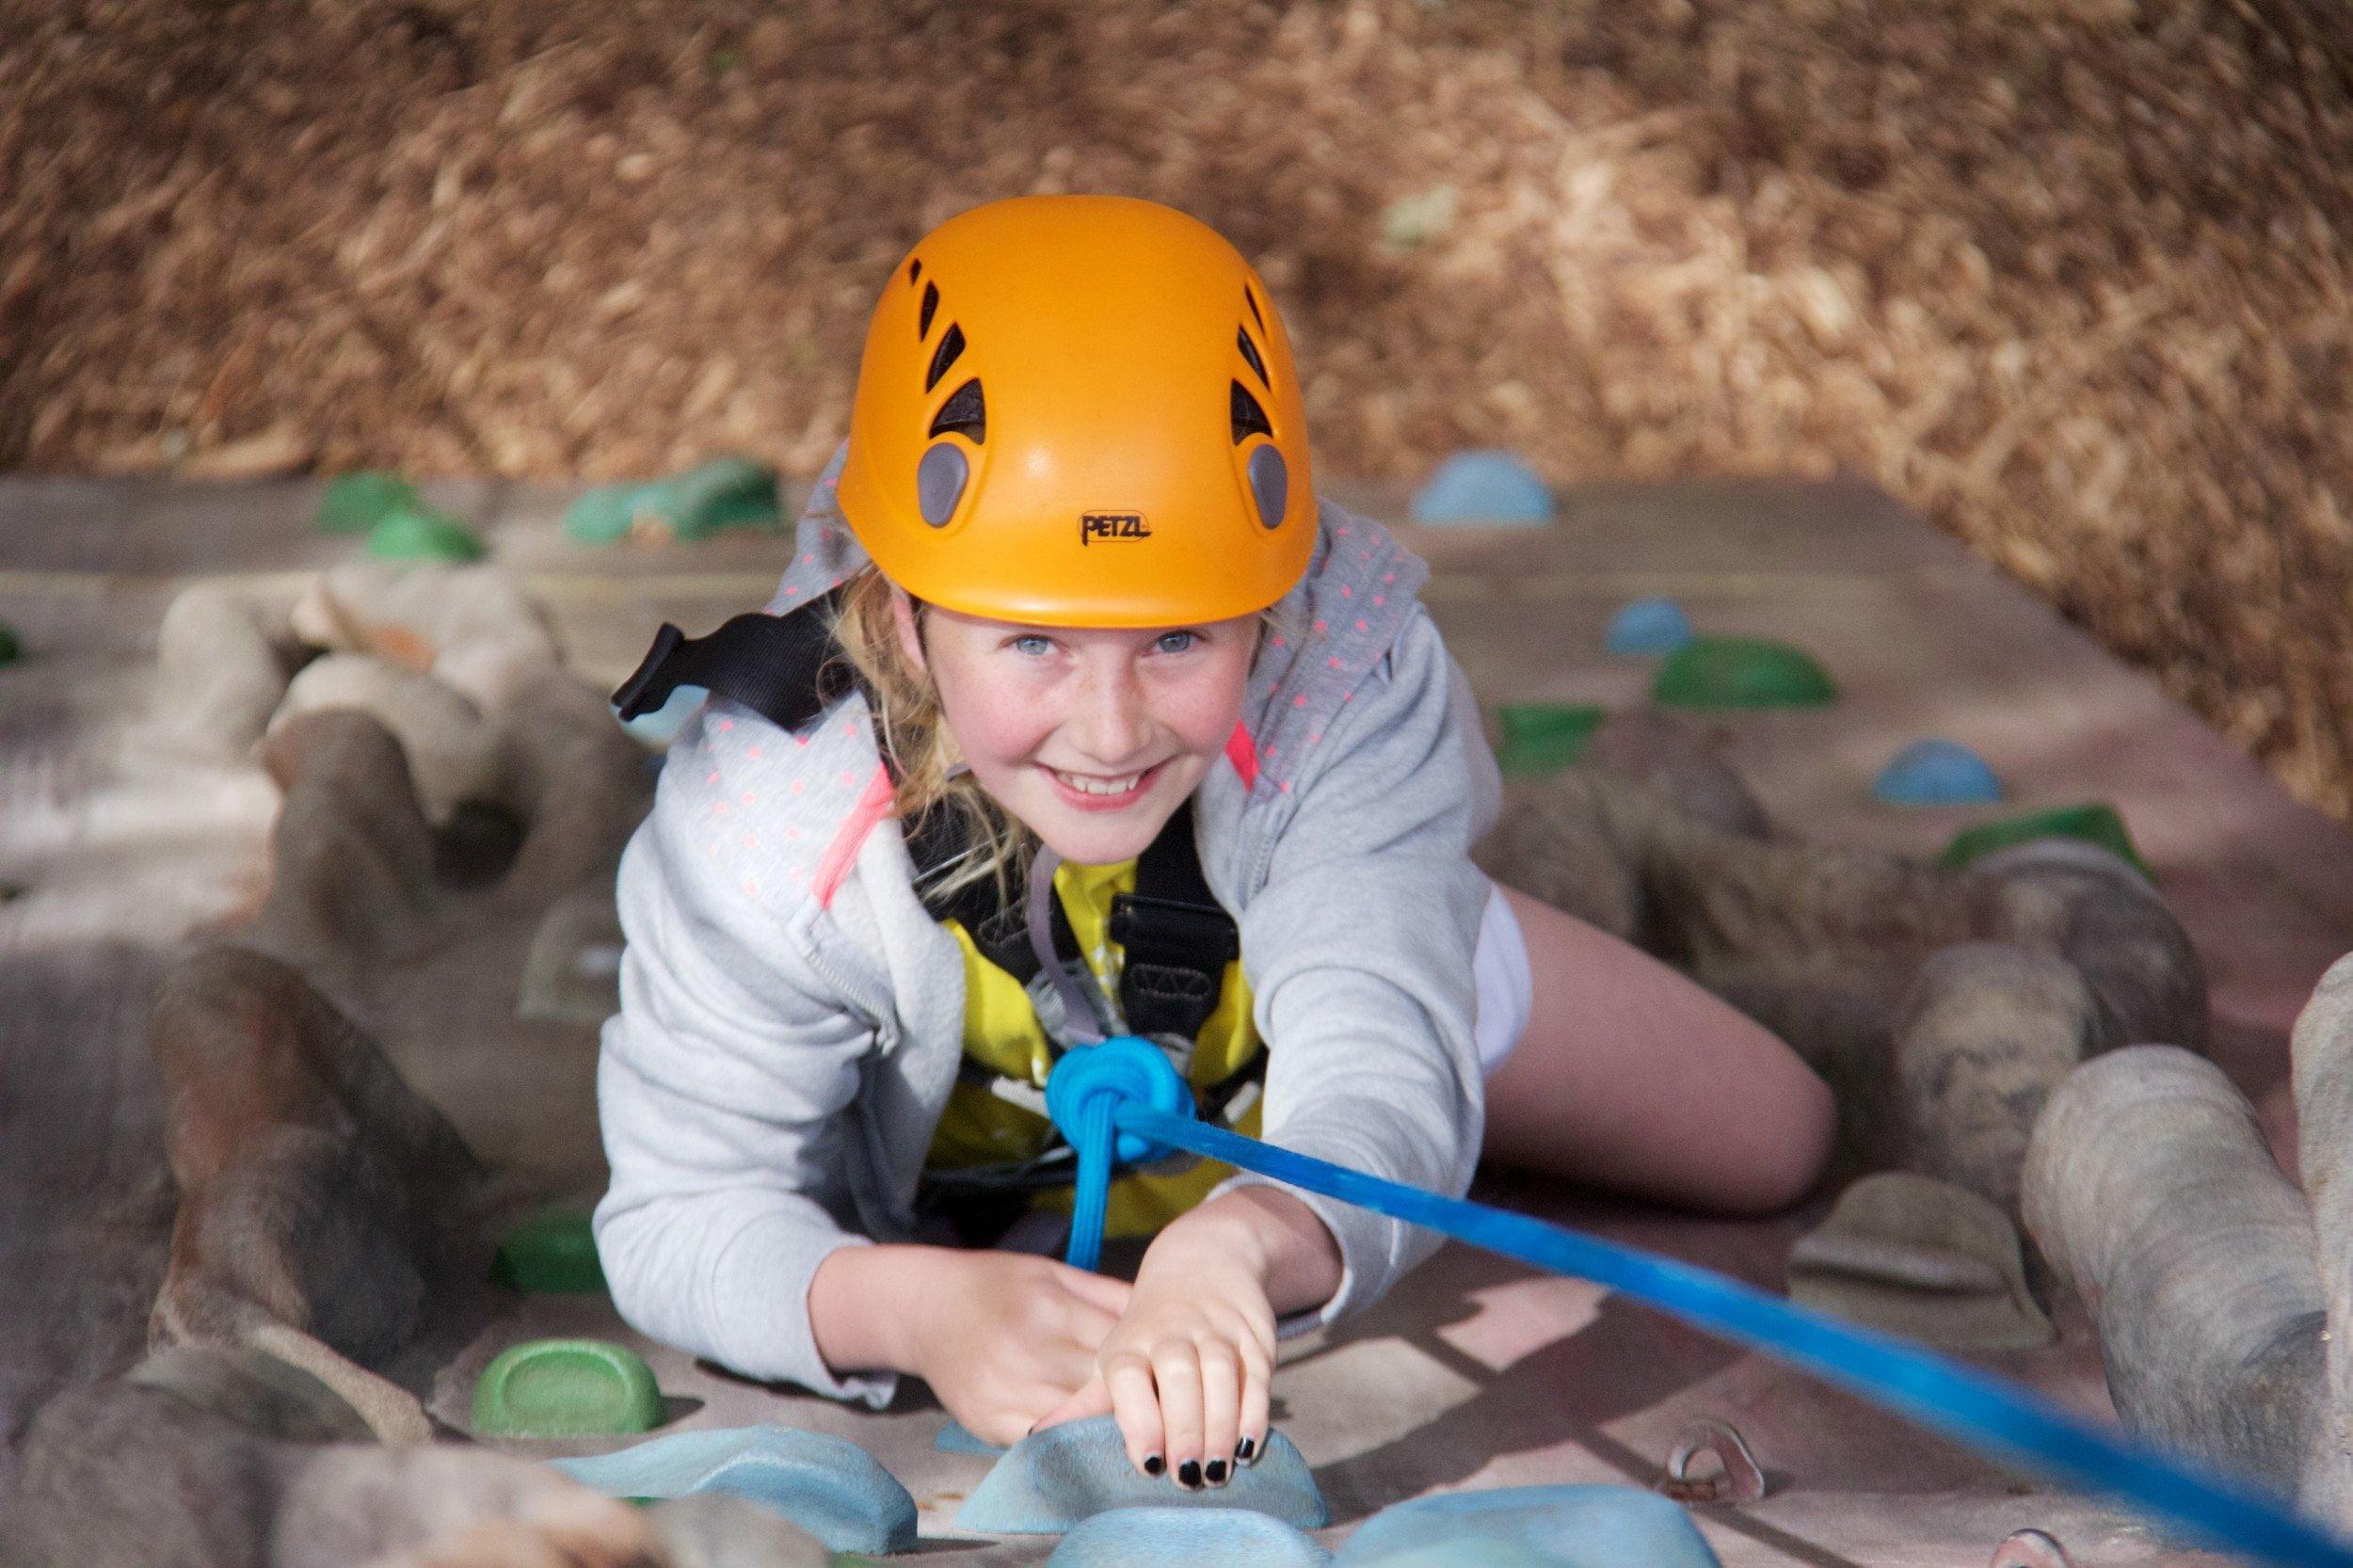 Avon Tyrrell, UK Youth Outdoor Activity Centre 16